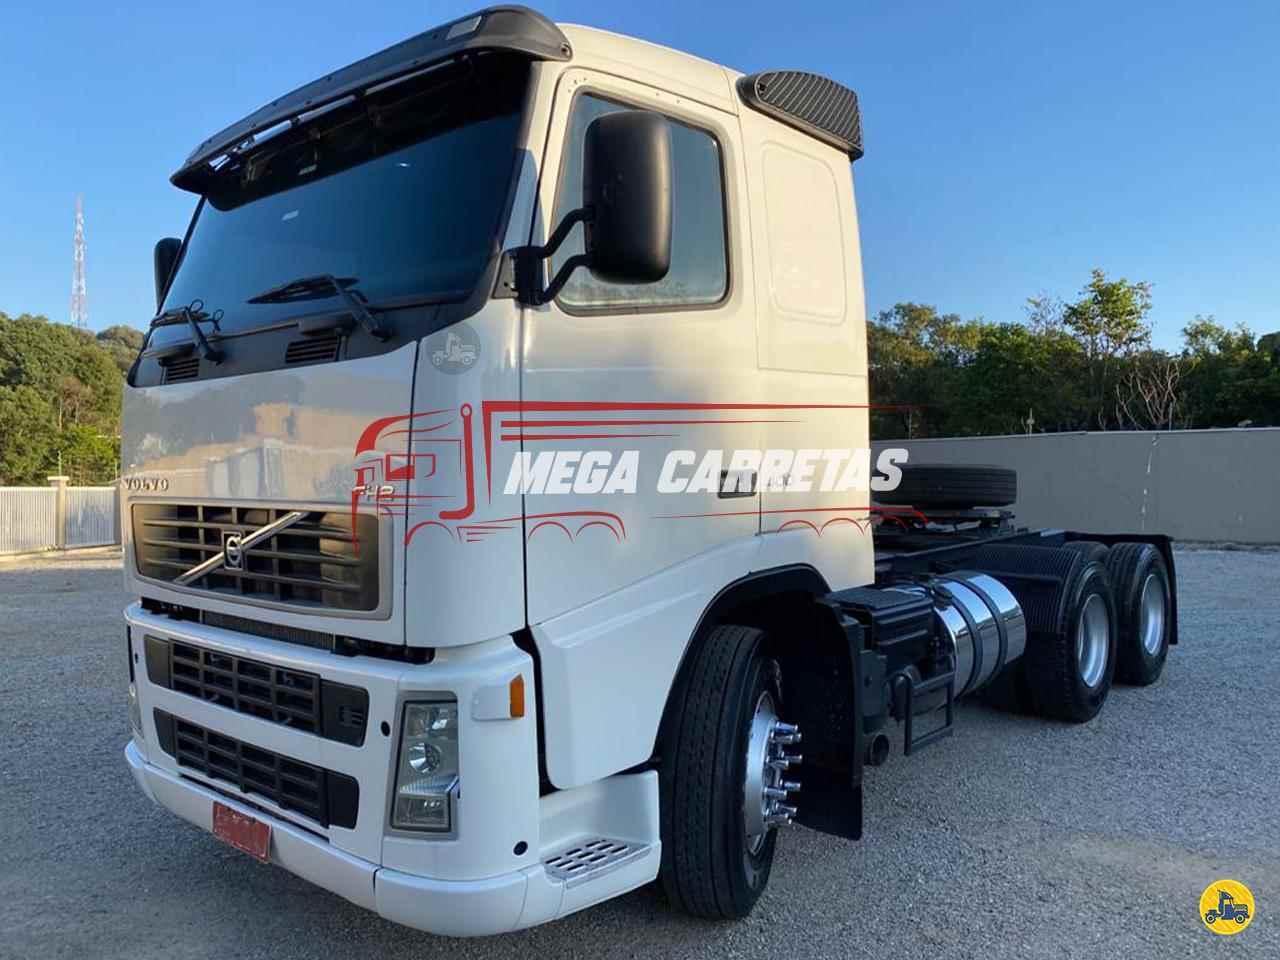 CAMINHAO VOLVO VOLVO FH 400 Cavalo Mecânico Truck 6x2 Mega Carretas COLOMBO PARANÁ PR